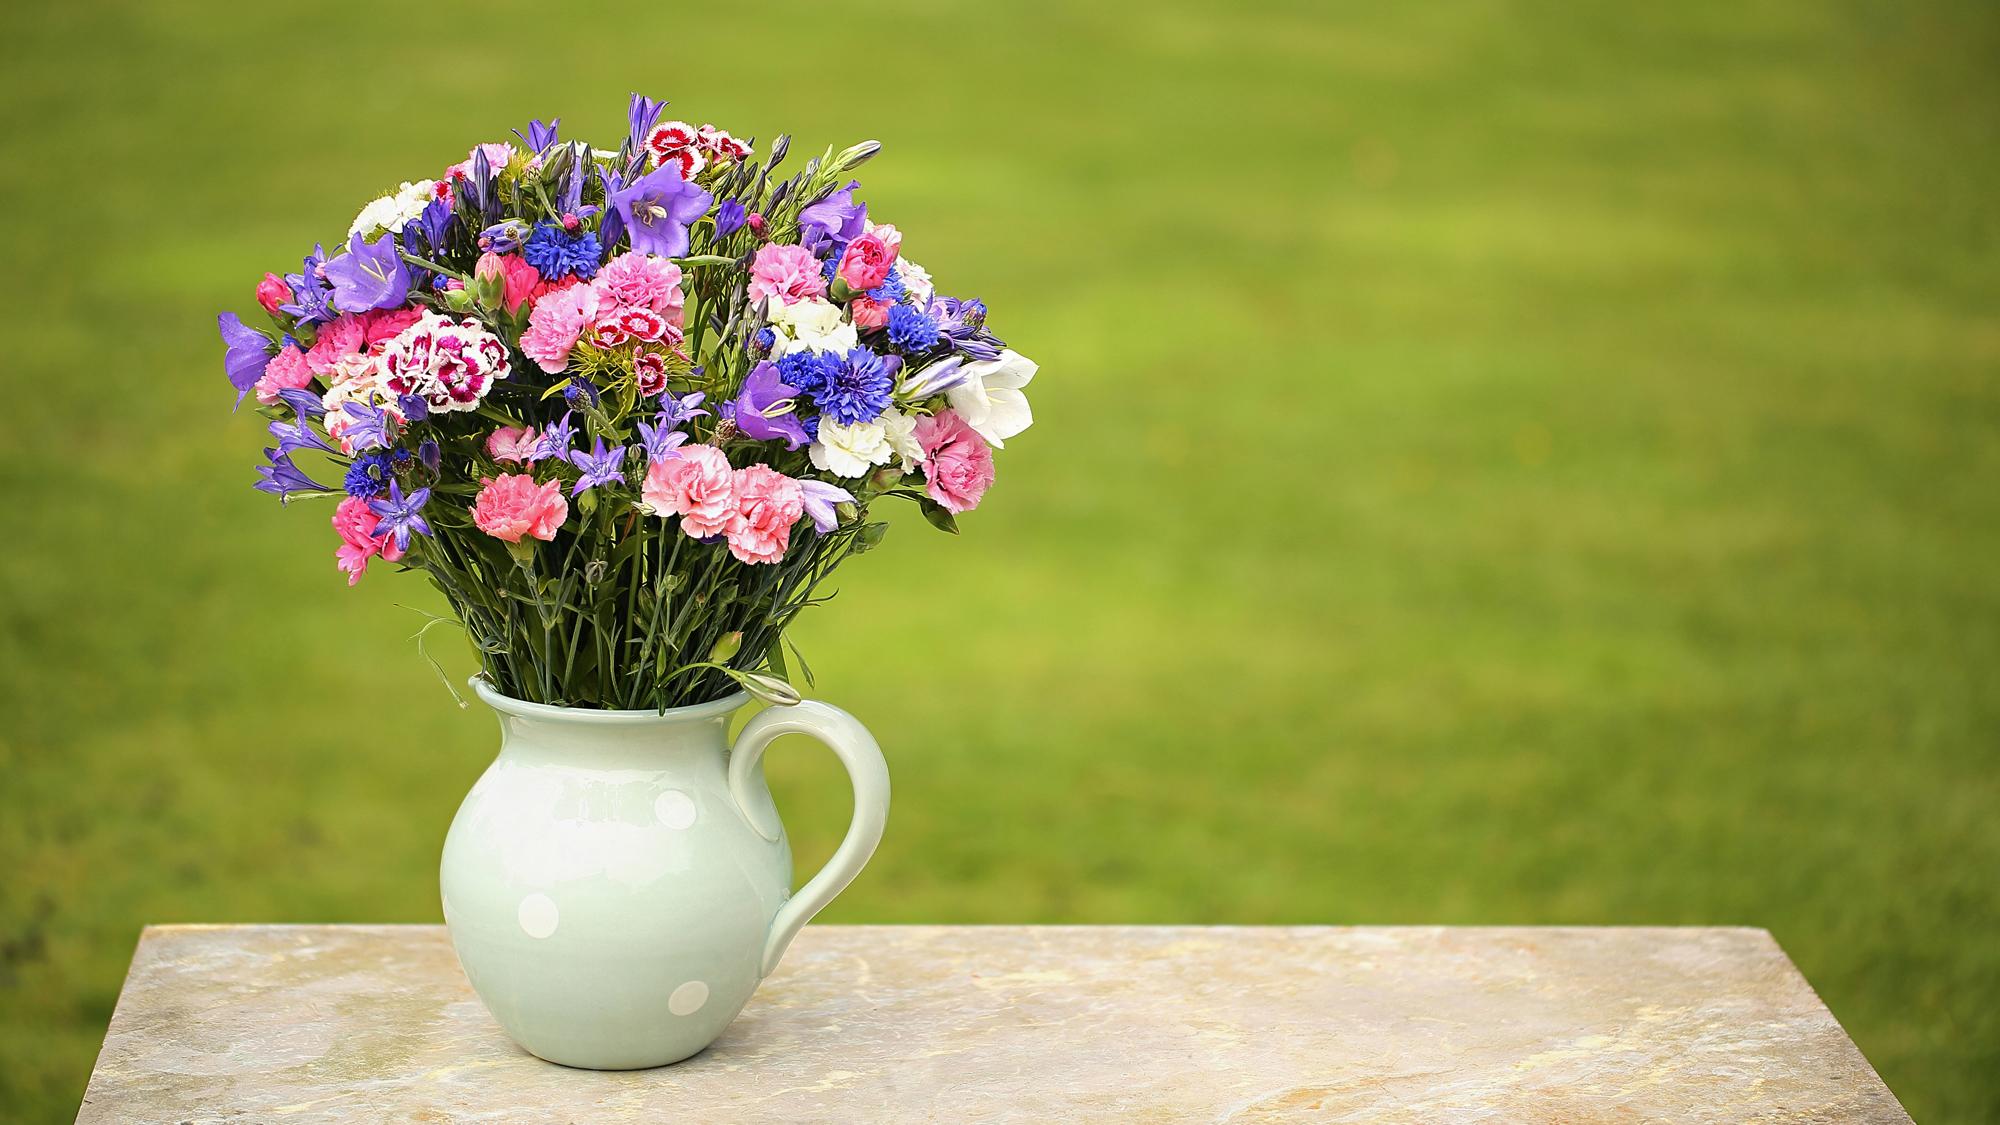 Welcome cornish blooms welcome izmirmasajfo